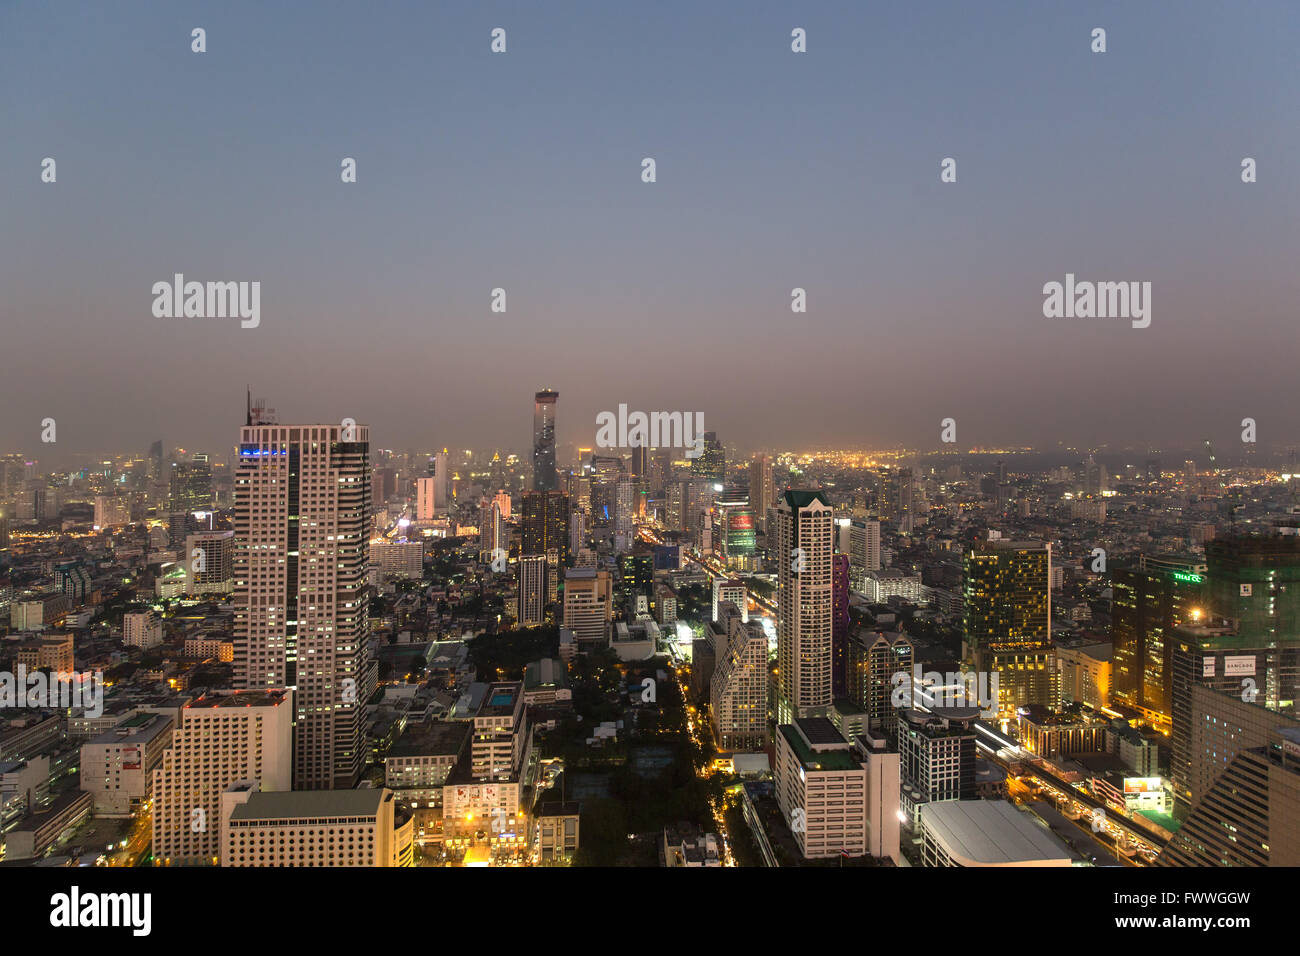 Panoramic view from the Sky Bar of Lebua State Tower on Bang Rak, Silom and Sathon district at dawn, Bangkok, Thailand - Stock Image